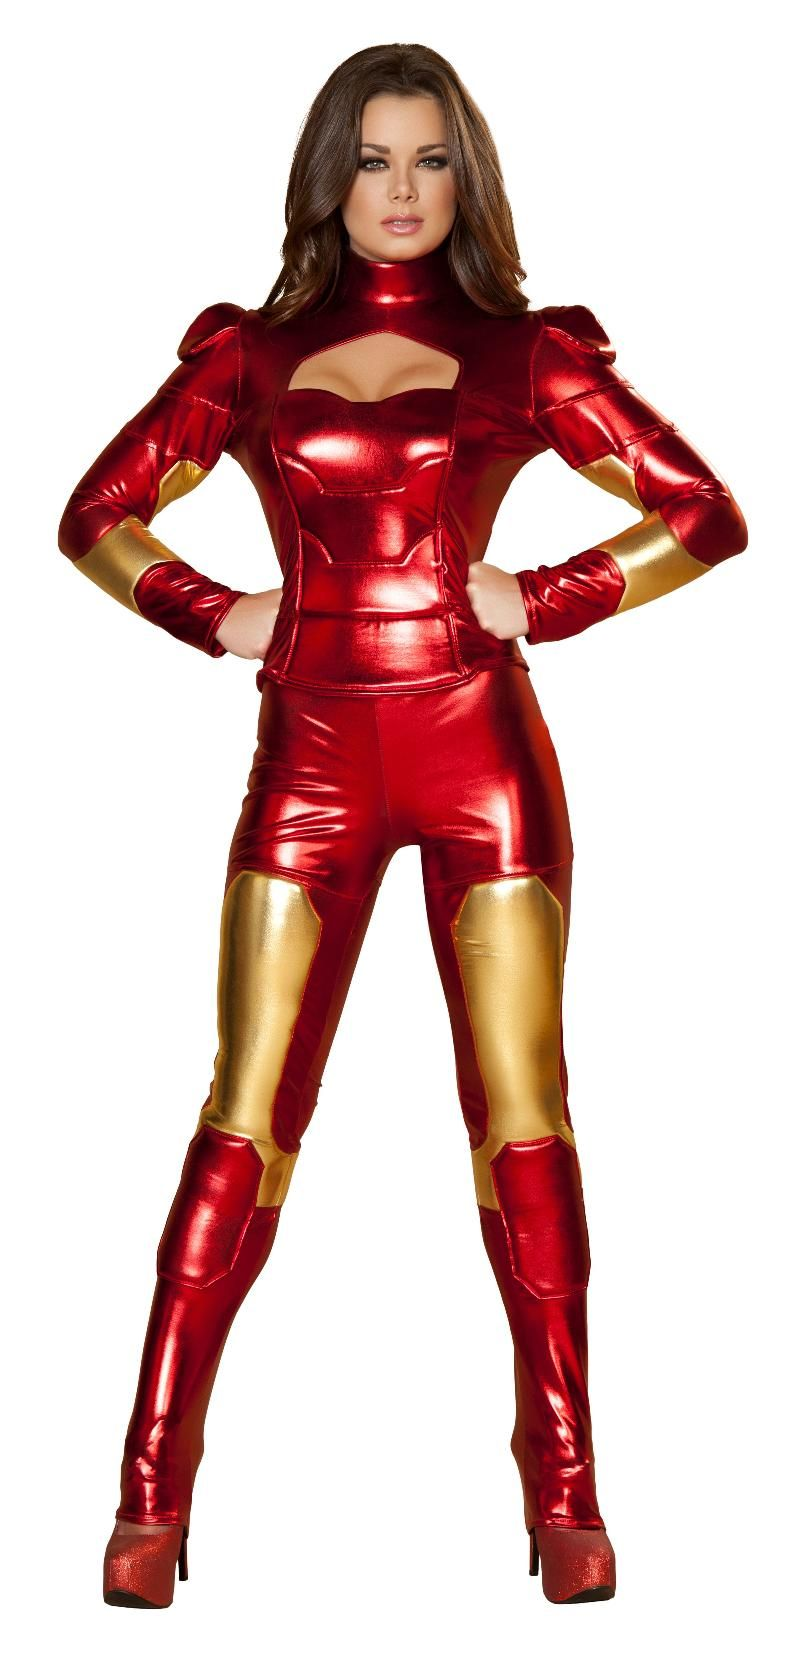 Girls Deluxe Costume Super Hero Halloween Fancy Dress Outfit